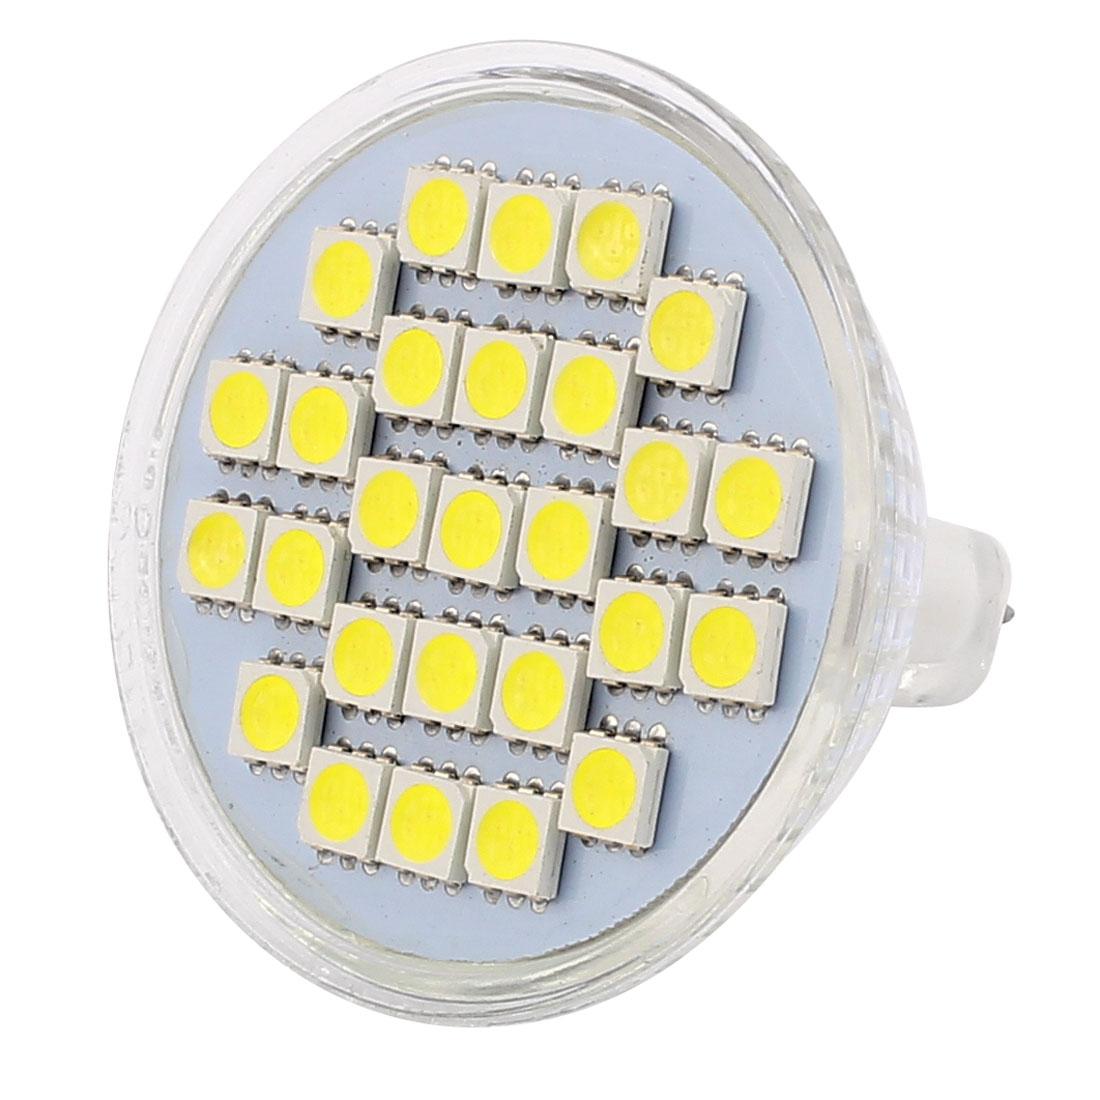 MR16 4W SMD5050 27LEDs Glass Energy Saving LED Lamp Bulb White AC 110V